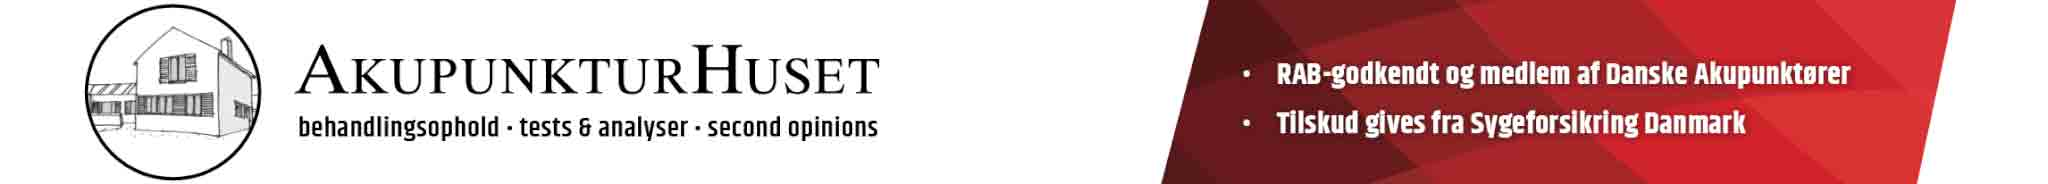 Akupunktur Huset Skive Logo